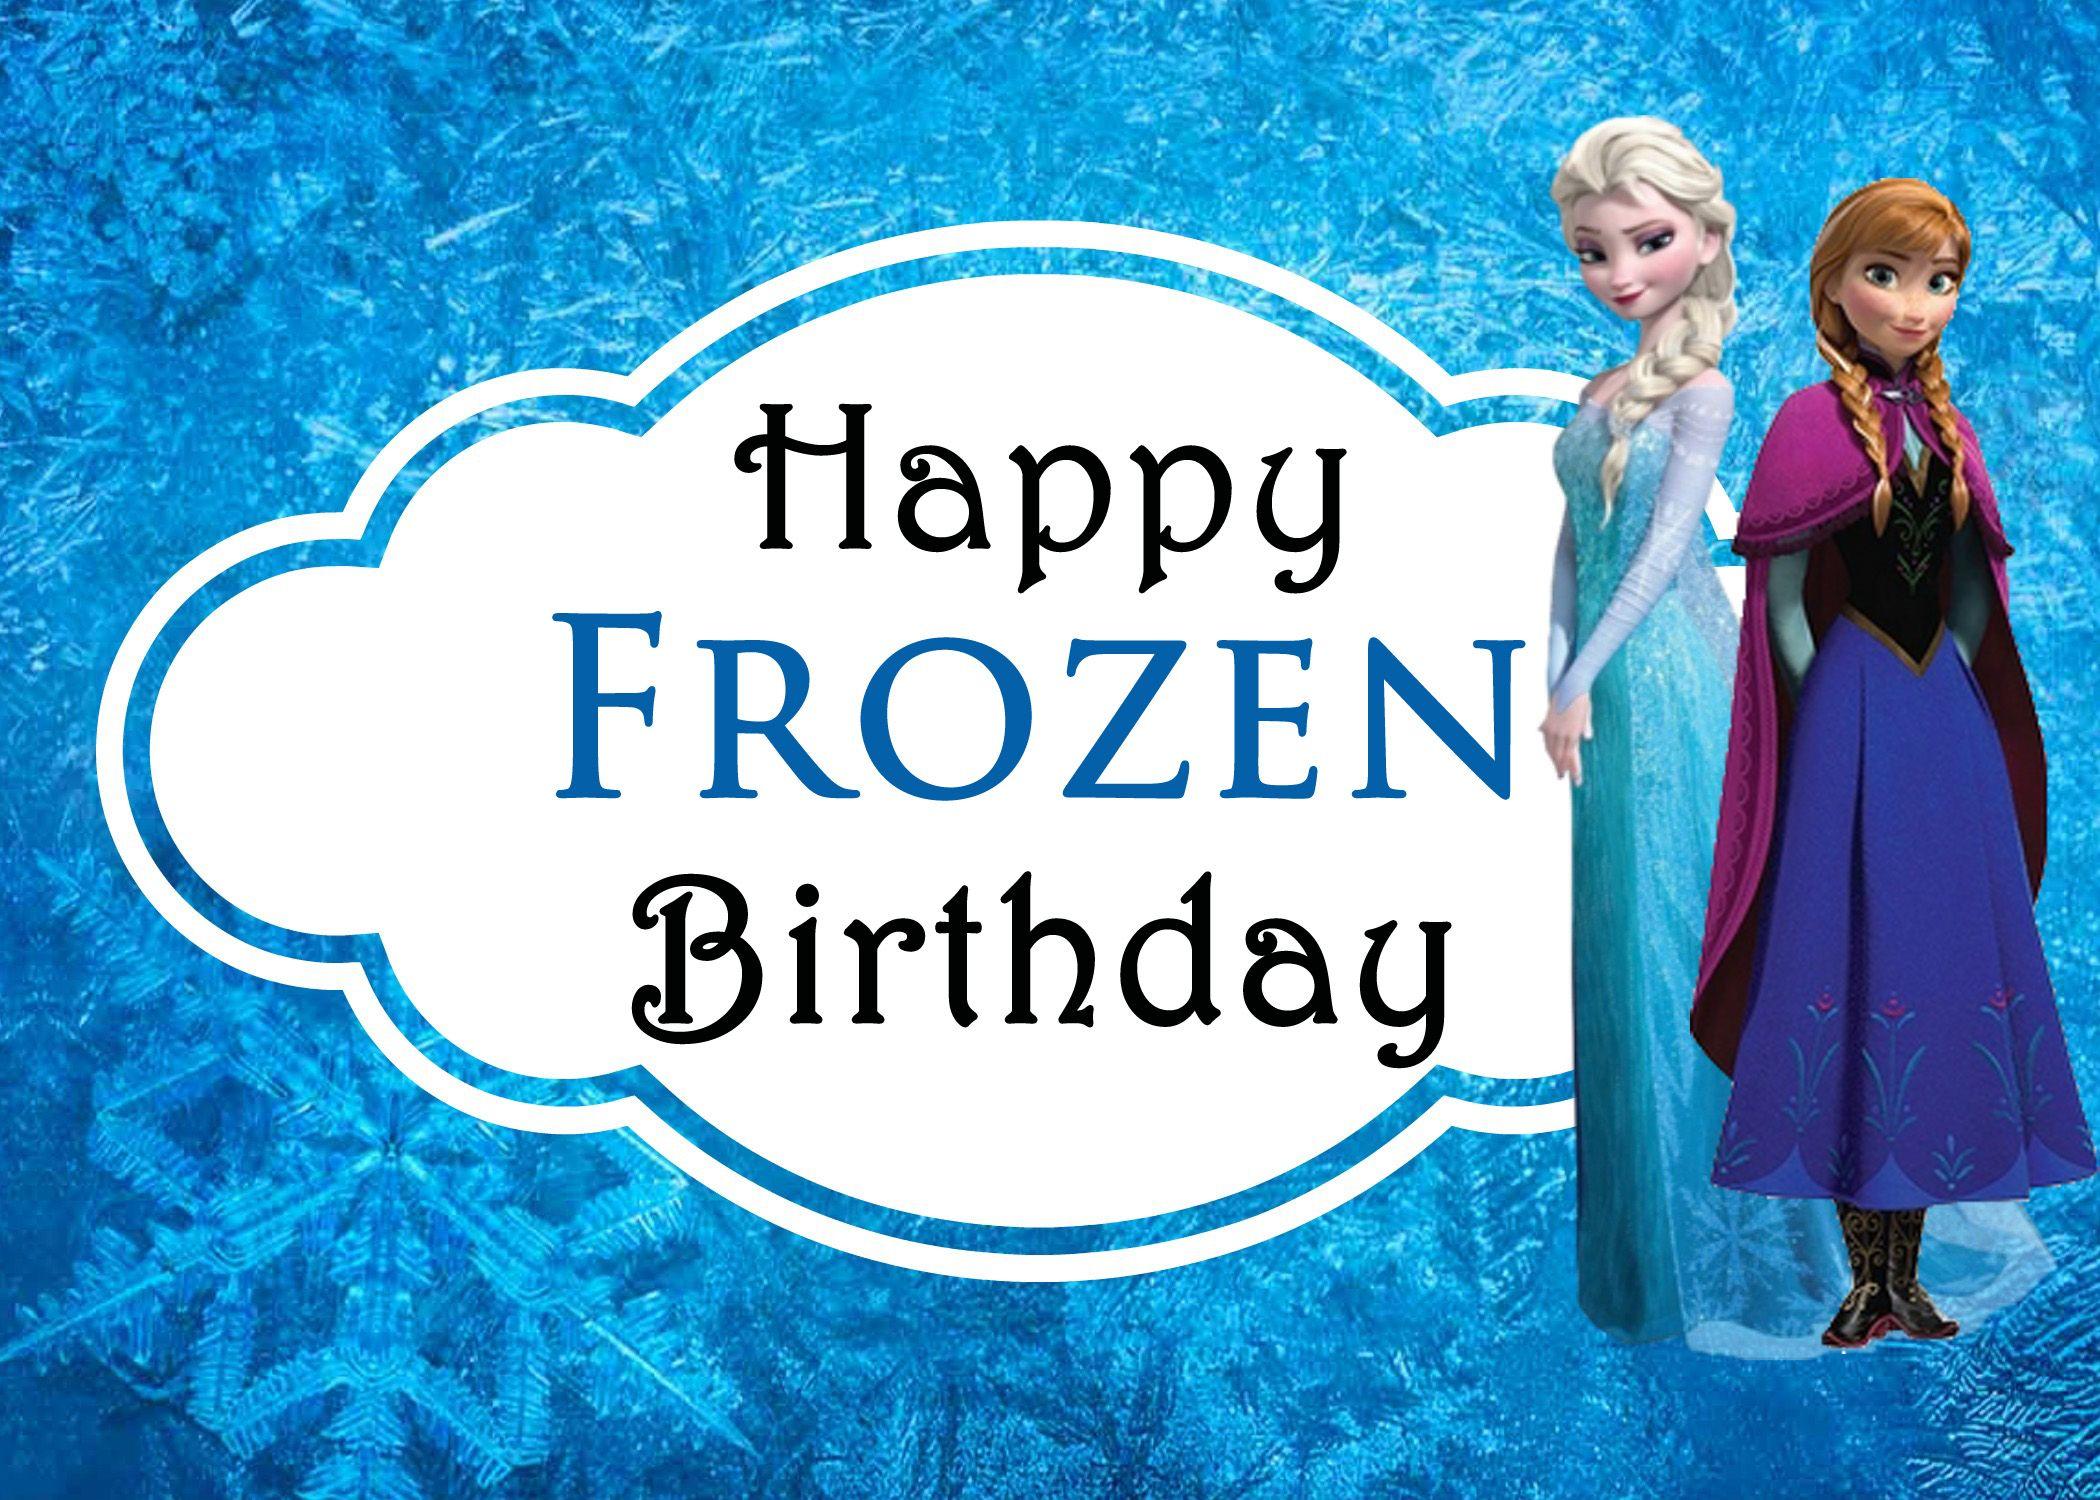 Celebrating Sisters With Disneys Frozen Free Printable Birthday – Make My Own Birthday Card Online Free